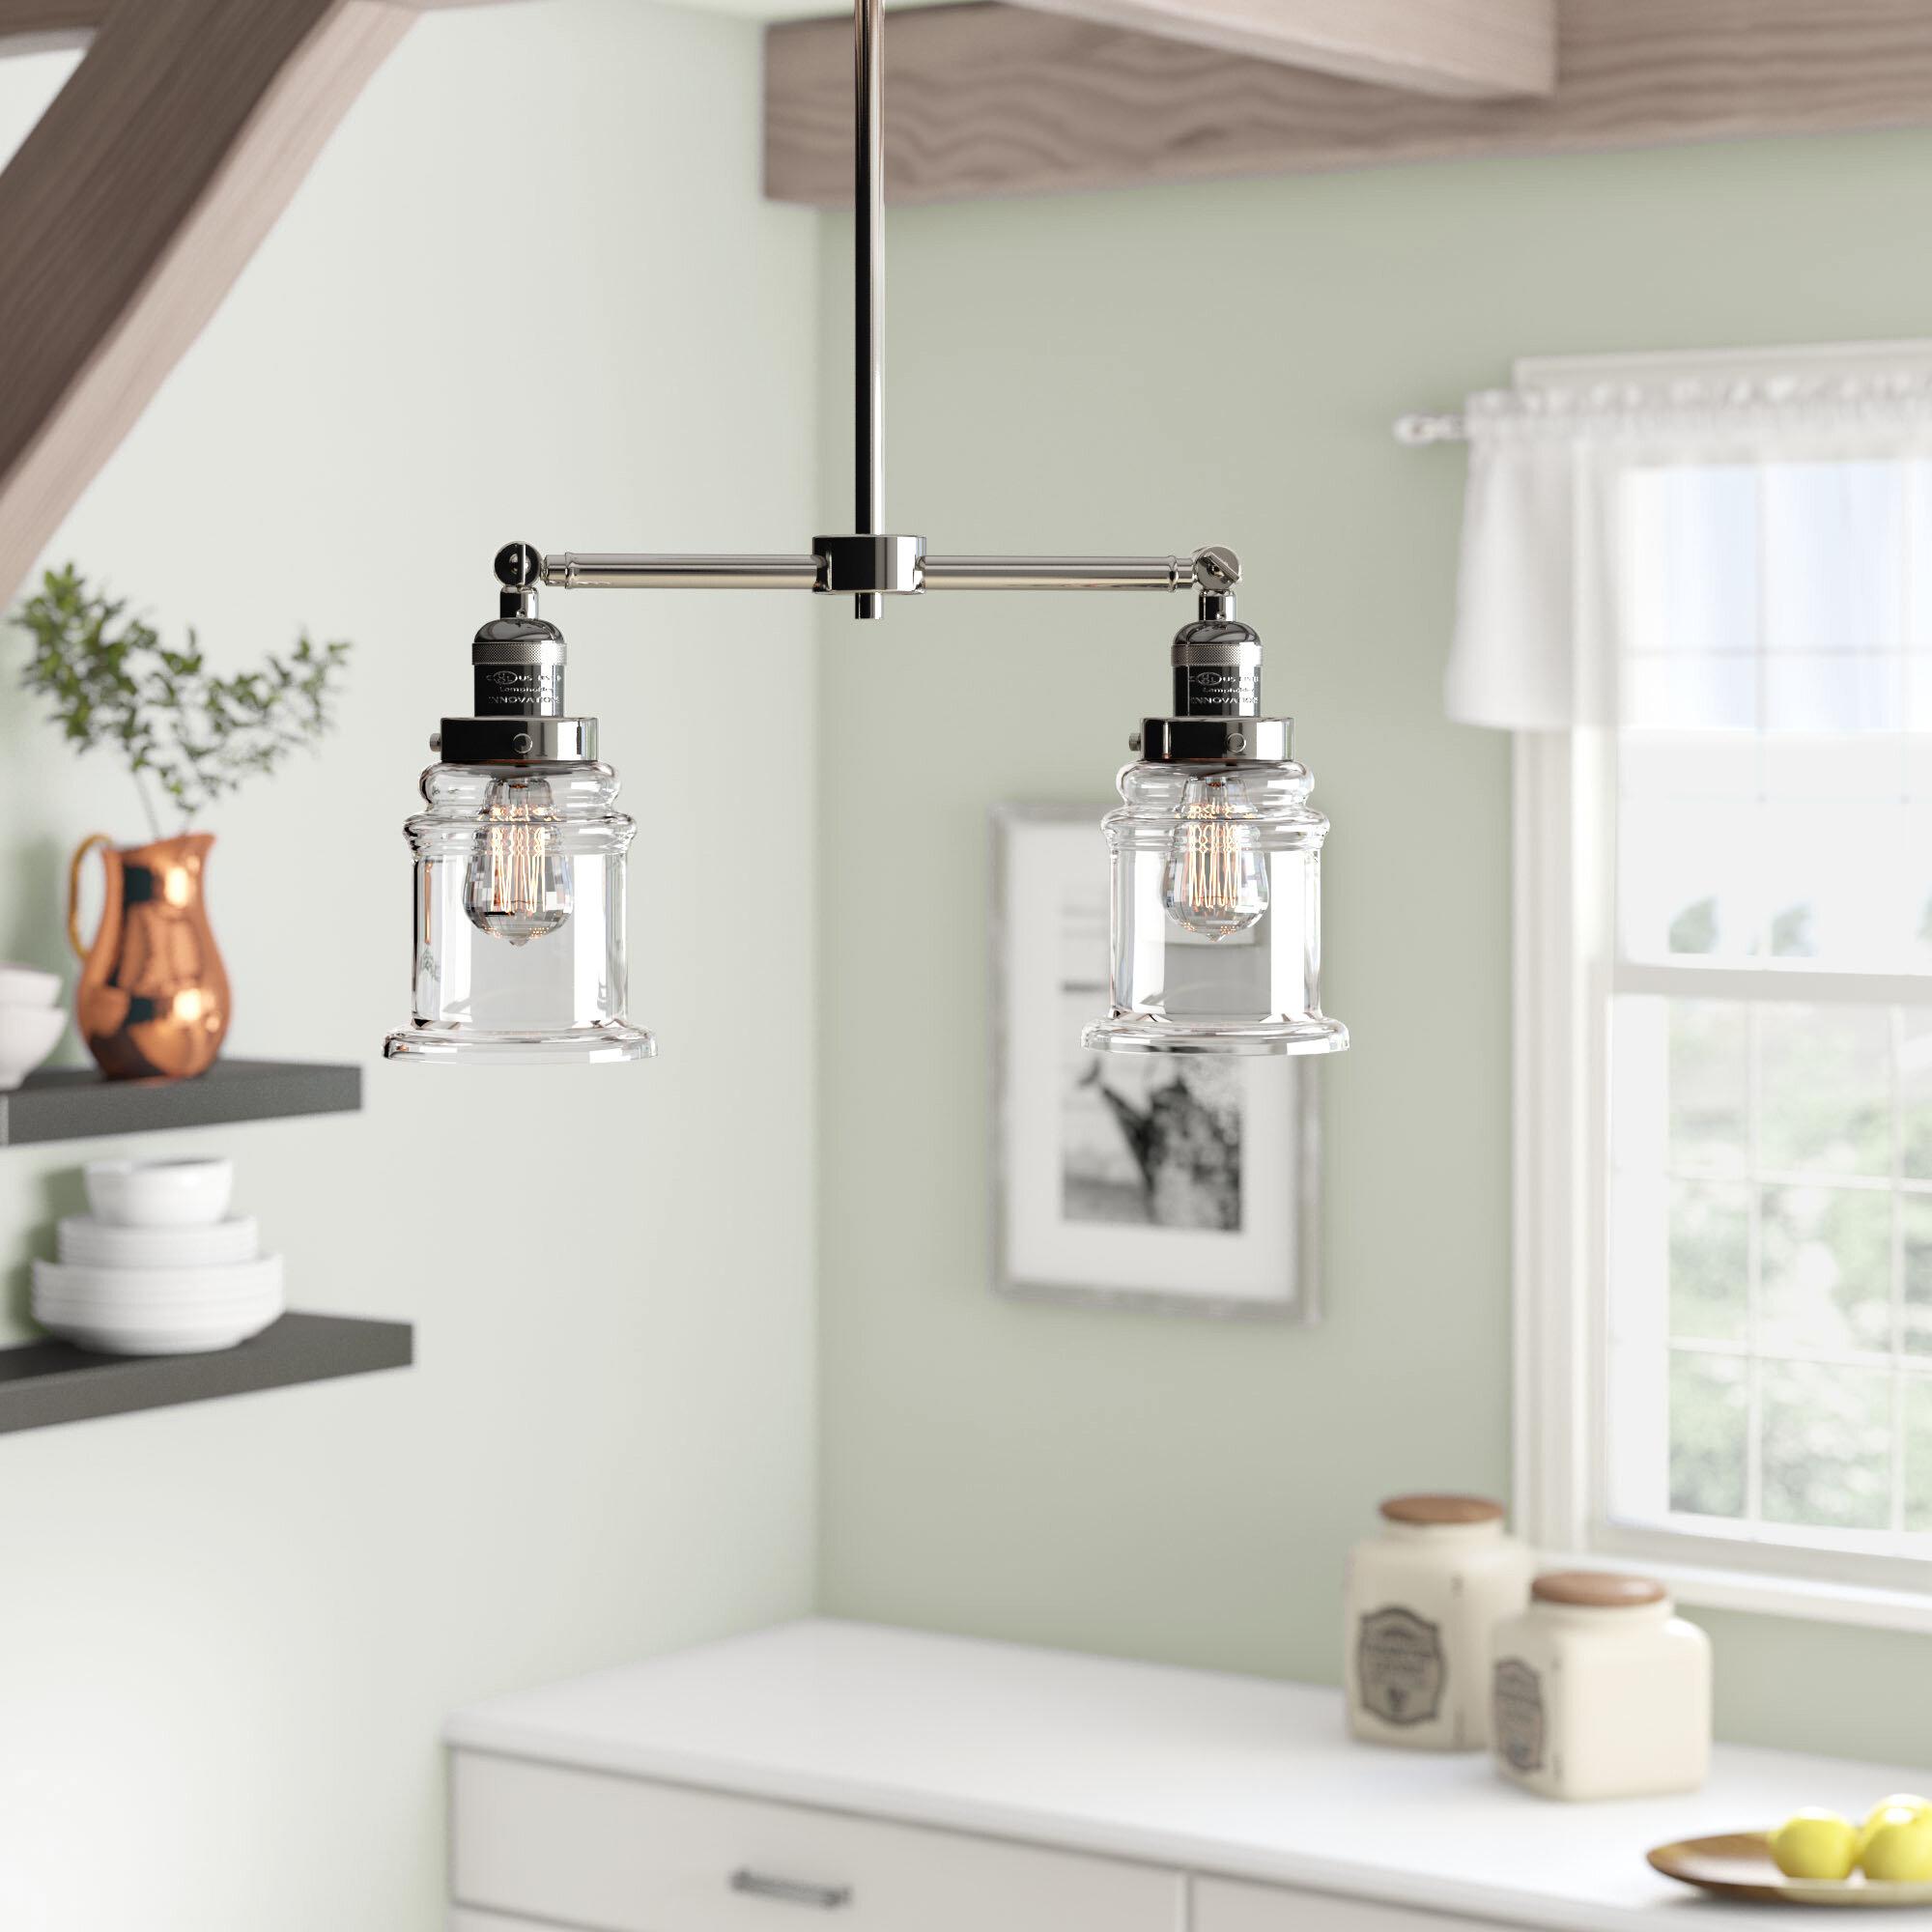 The Kitchen Greeley: Laurel Foundry Modern Farmhouse Greeley 2-Light Kitchen